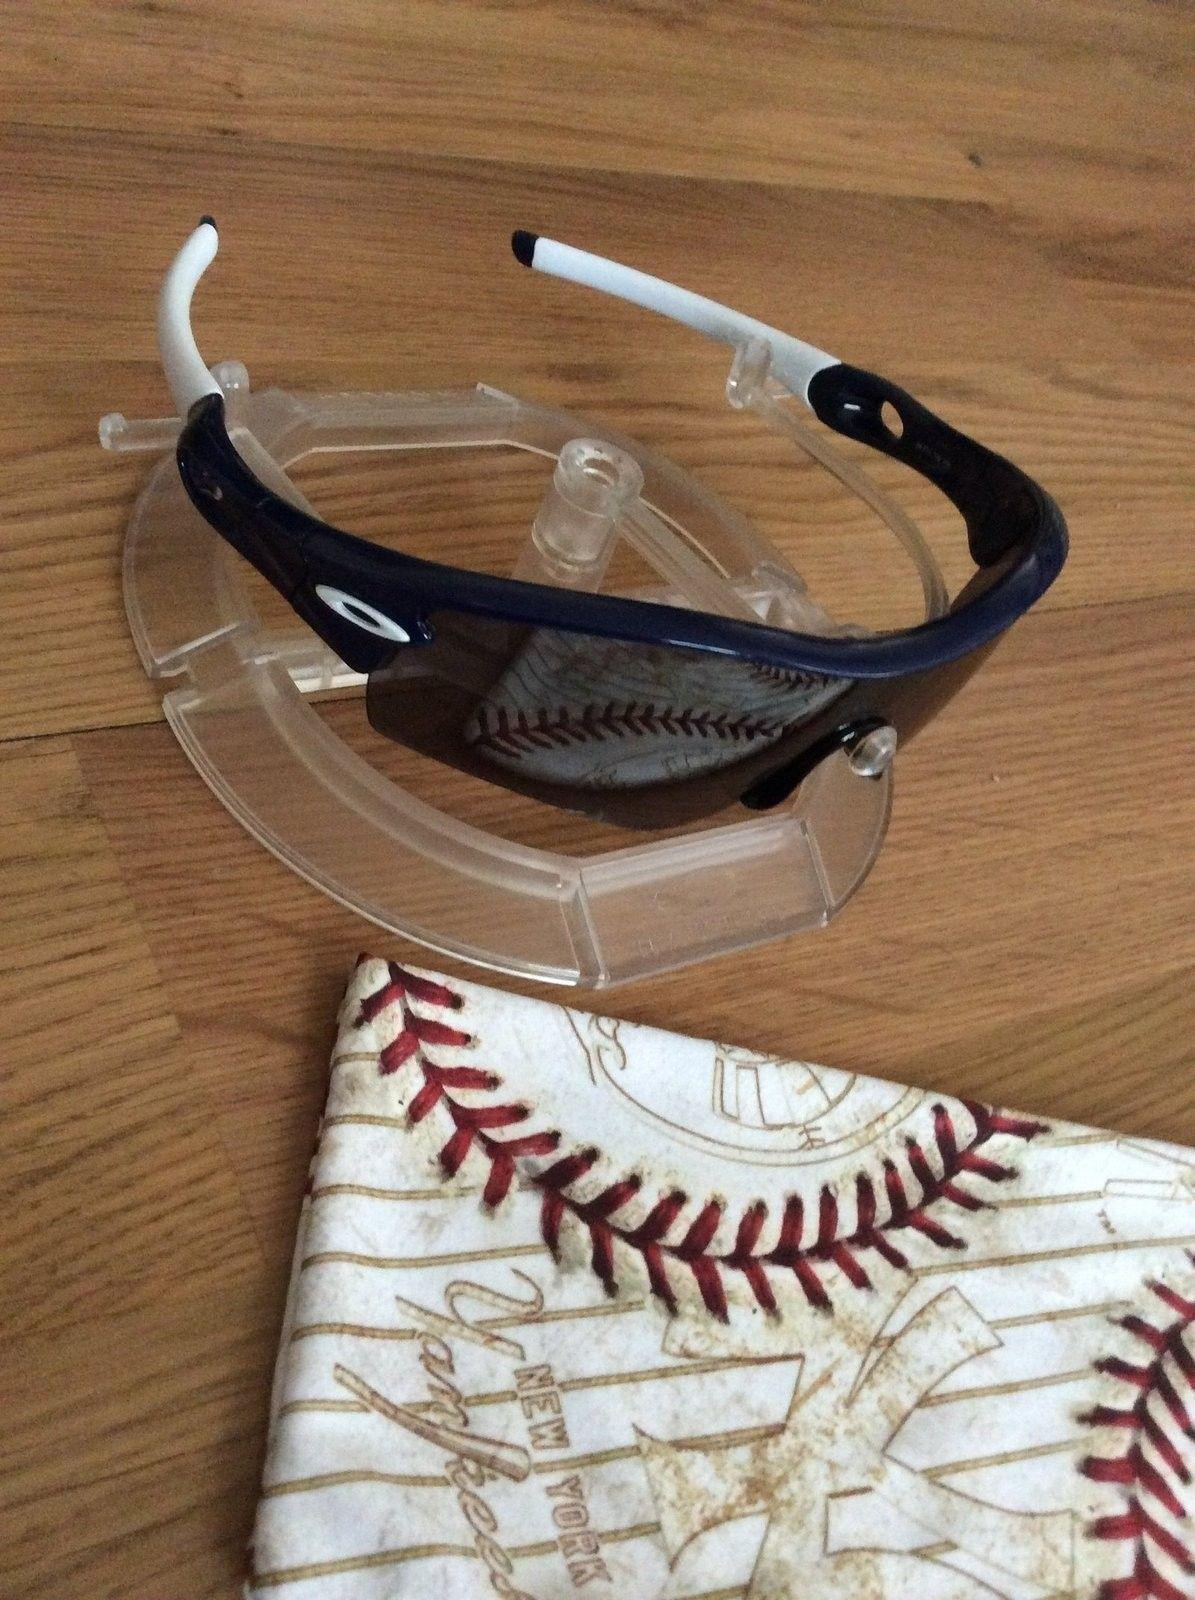 NWOB Radar MLB $100 Shipped - image.jpg